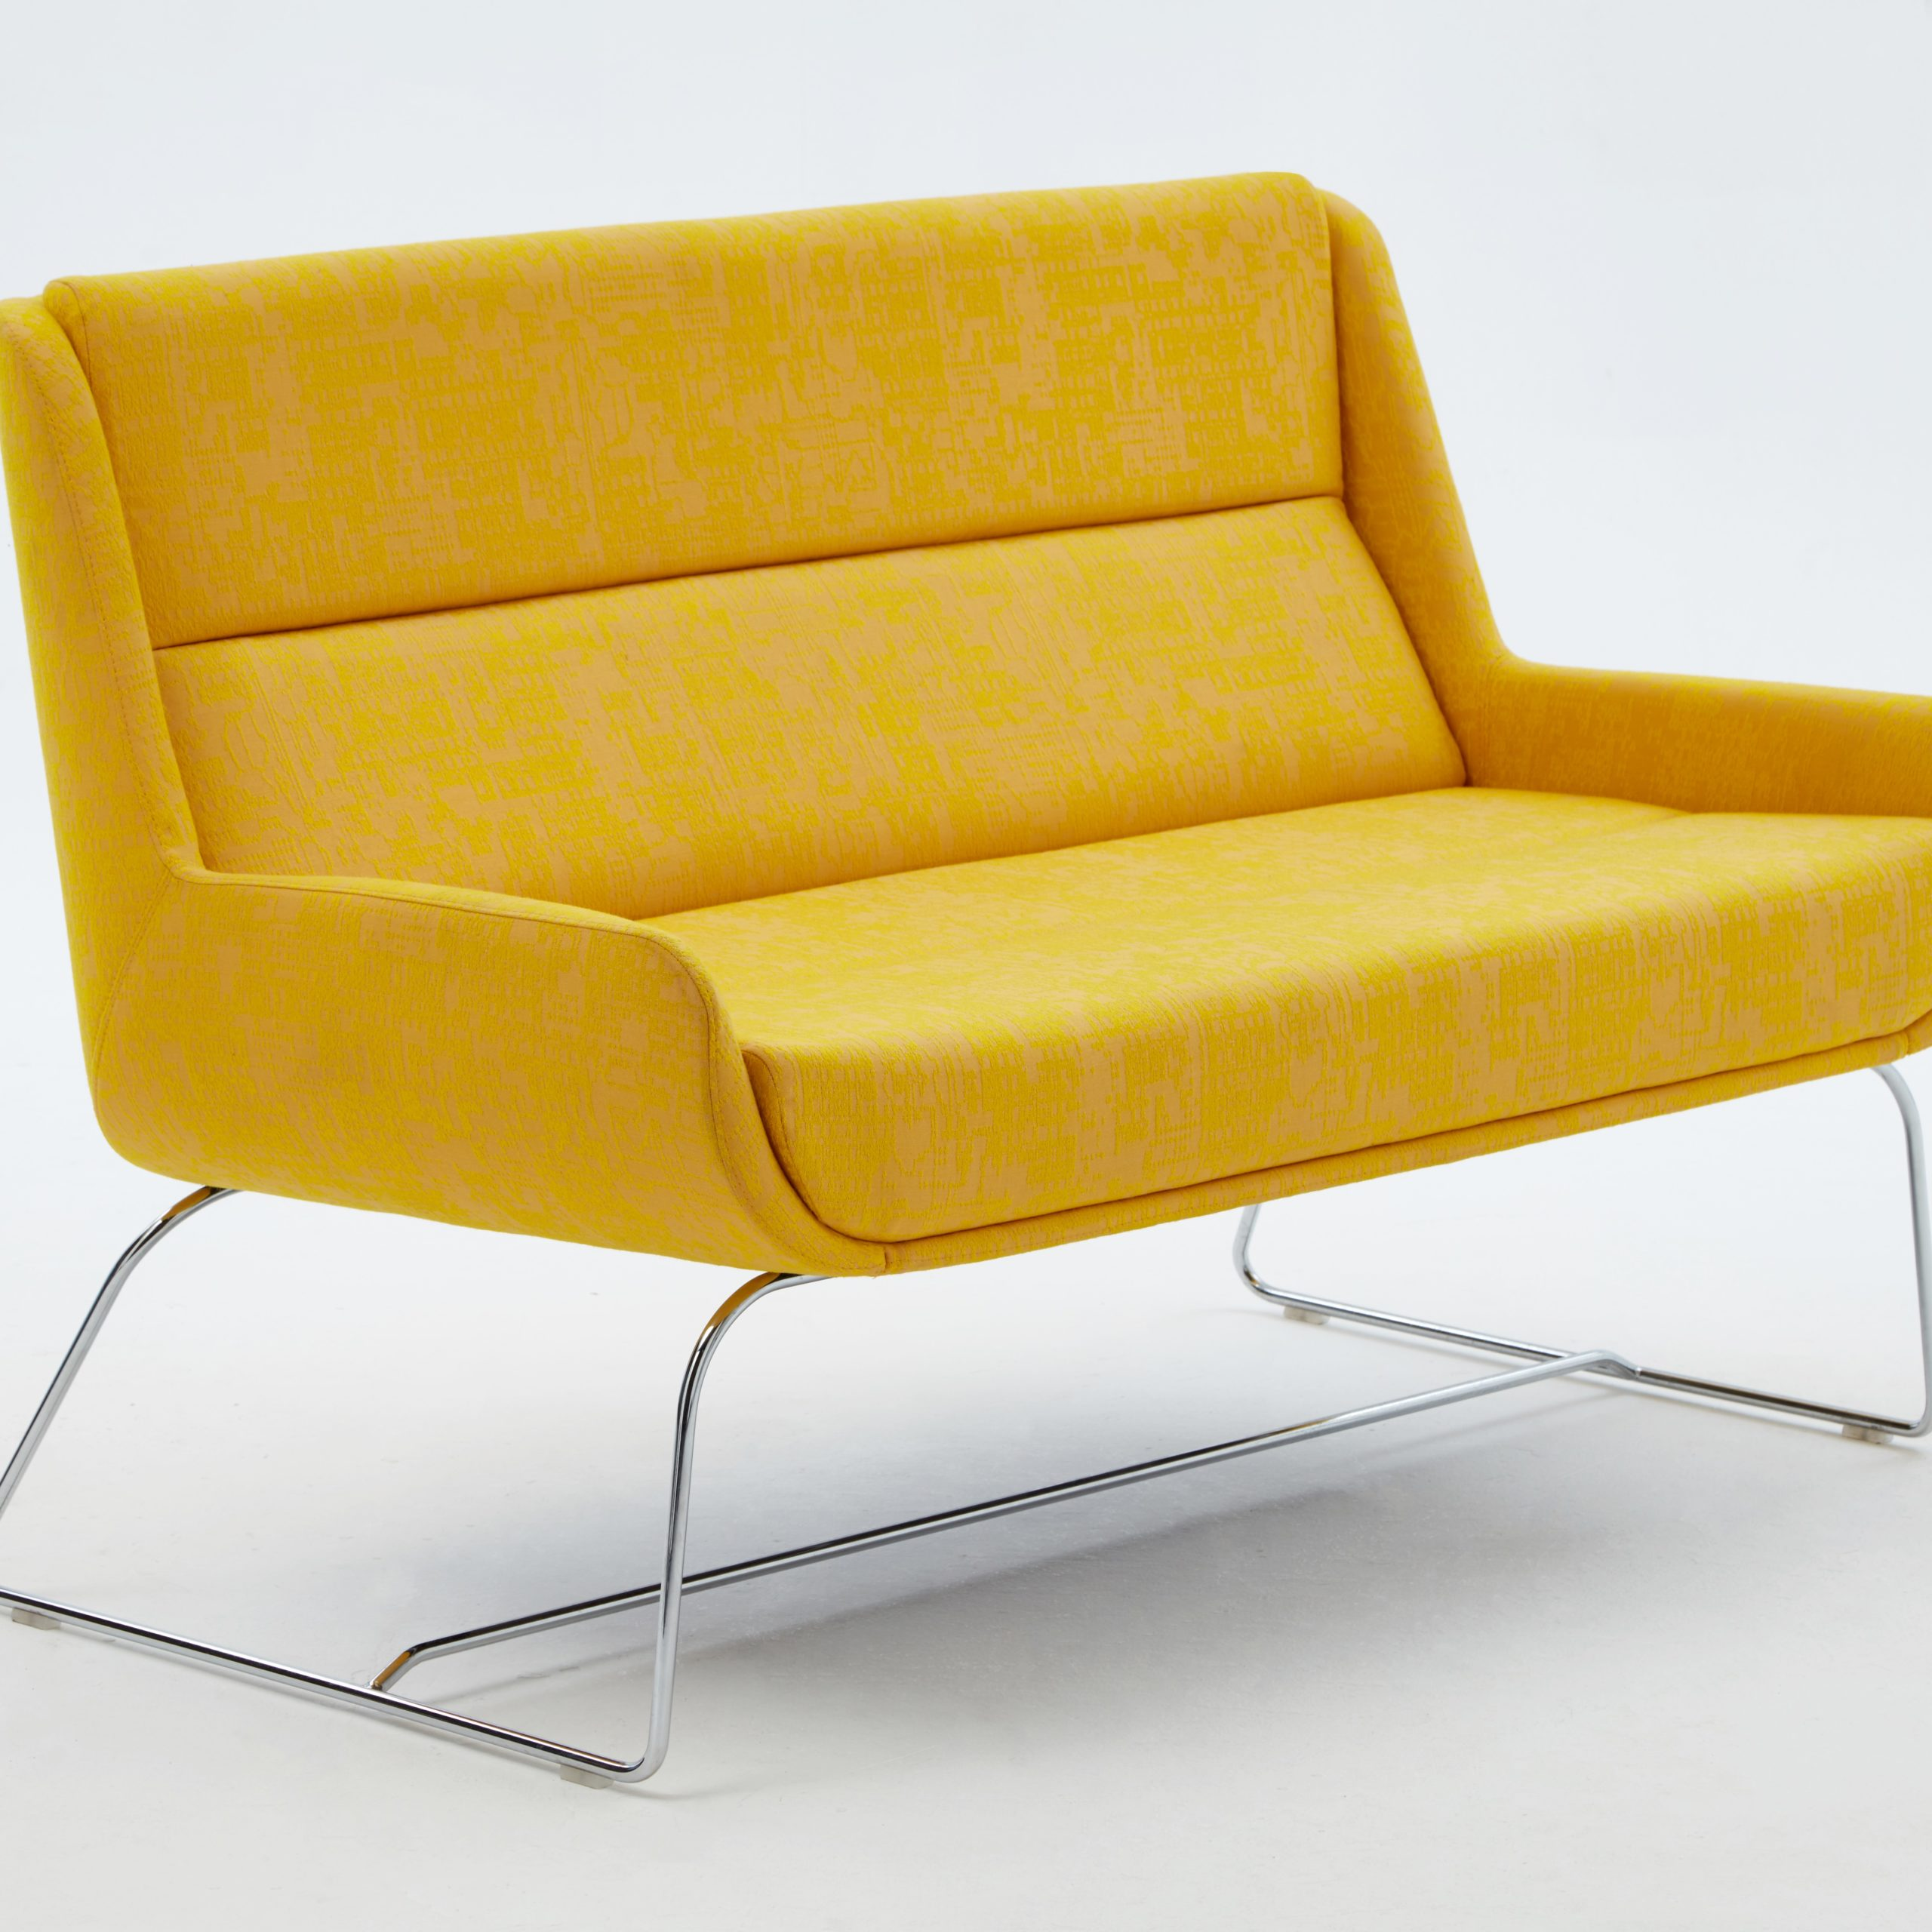 hush-low-naughtone-sofa-scaled